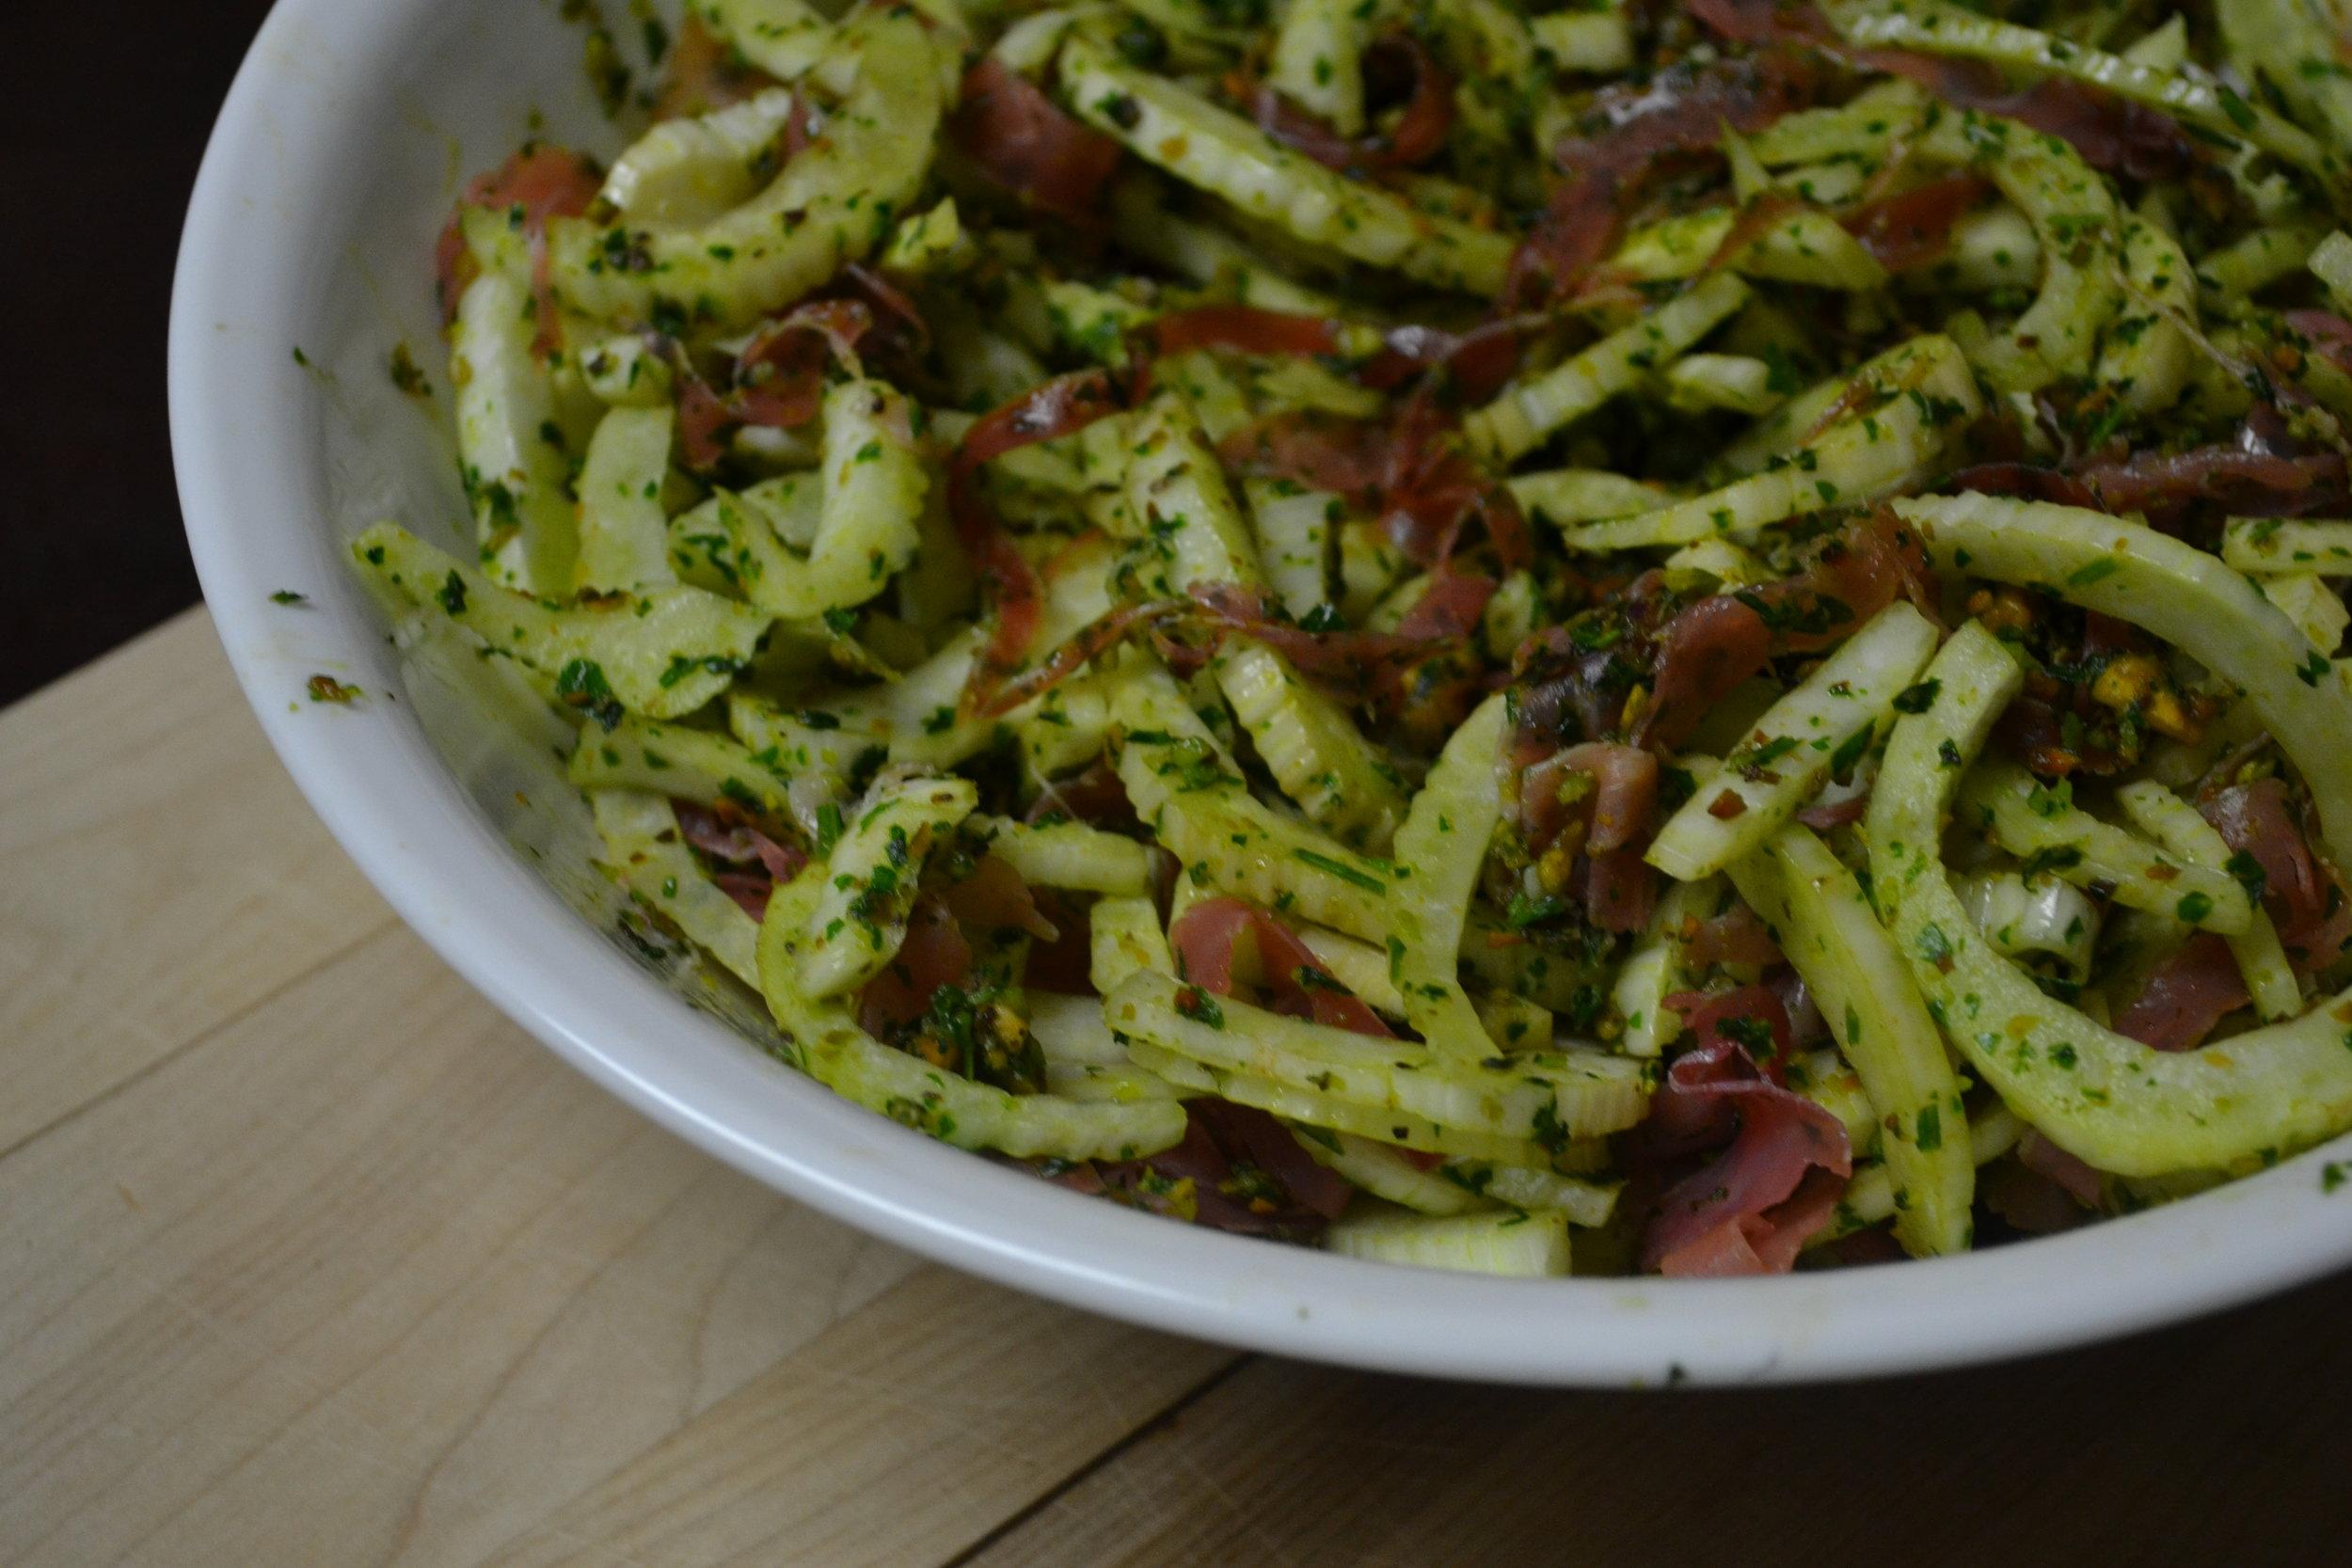 Fennel slaw with pistachio pesto and proscuitto